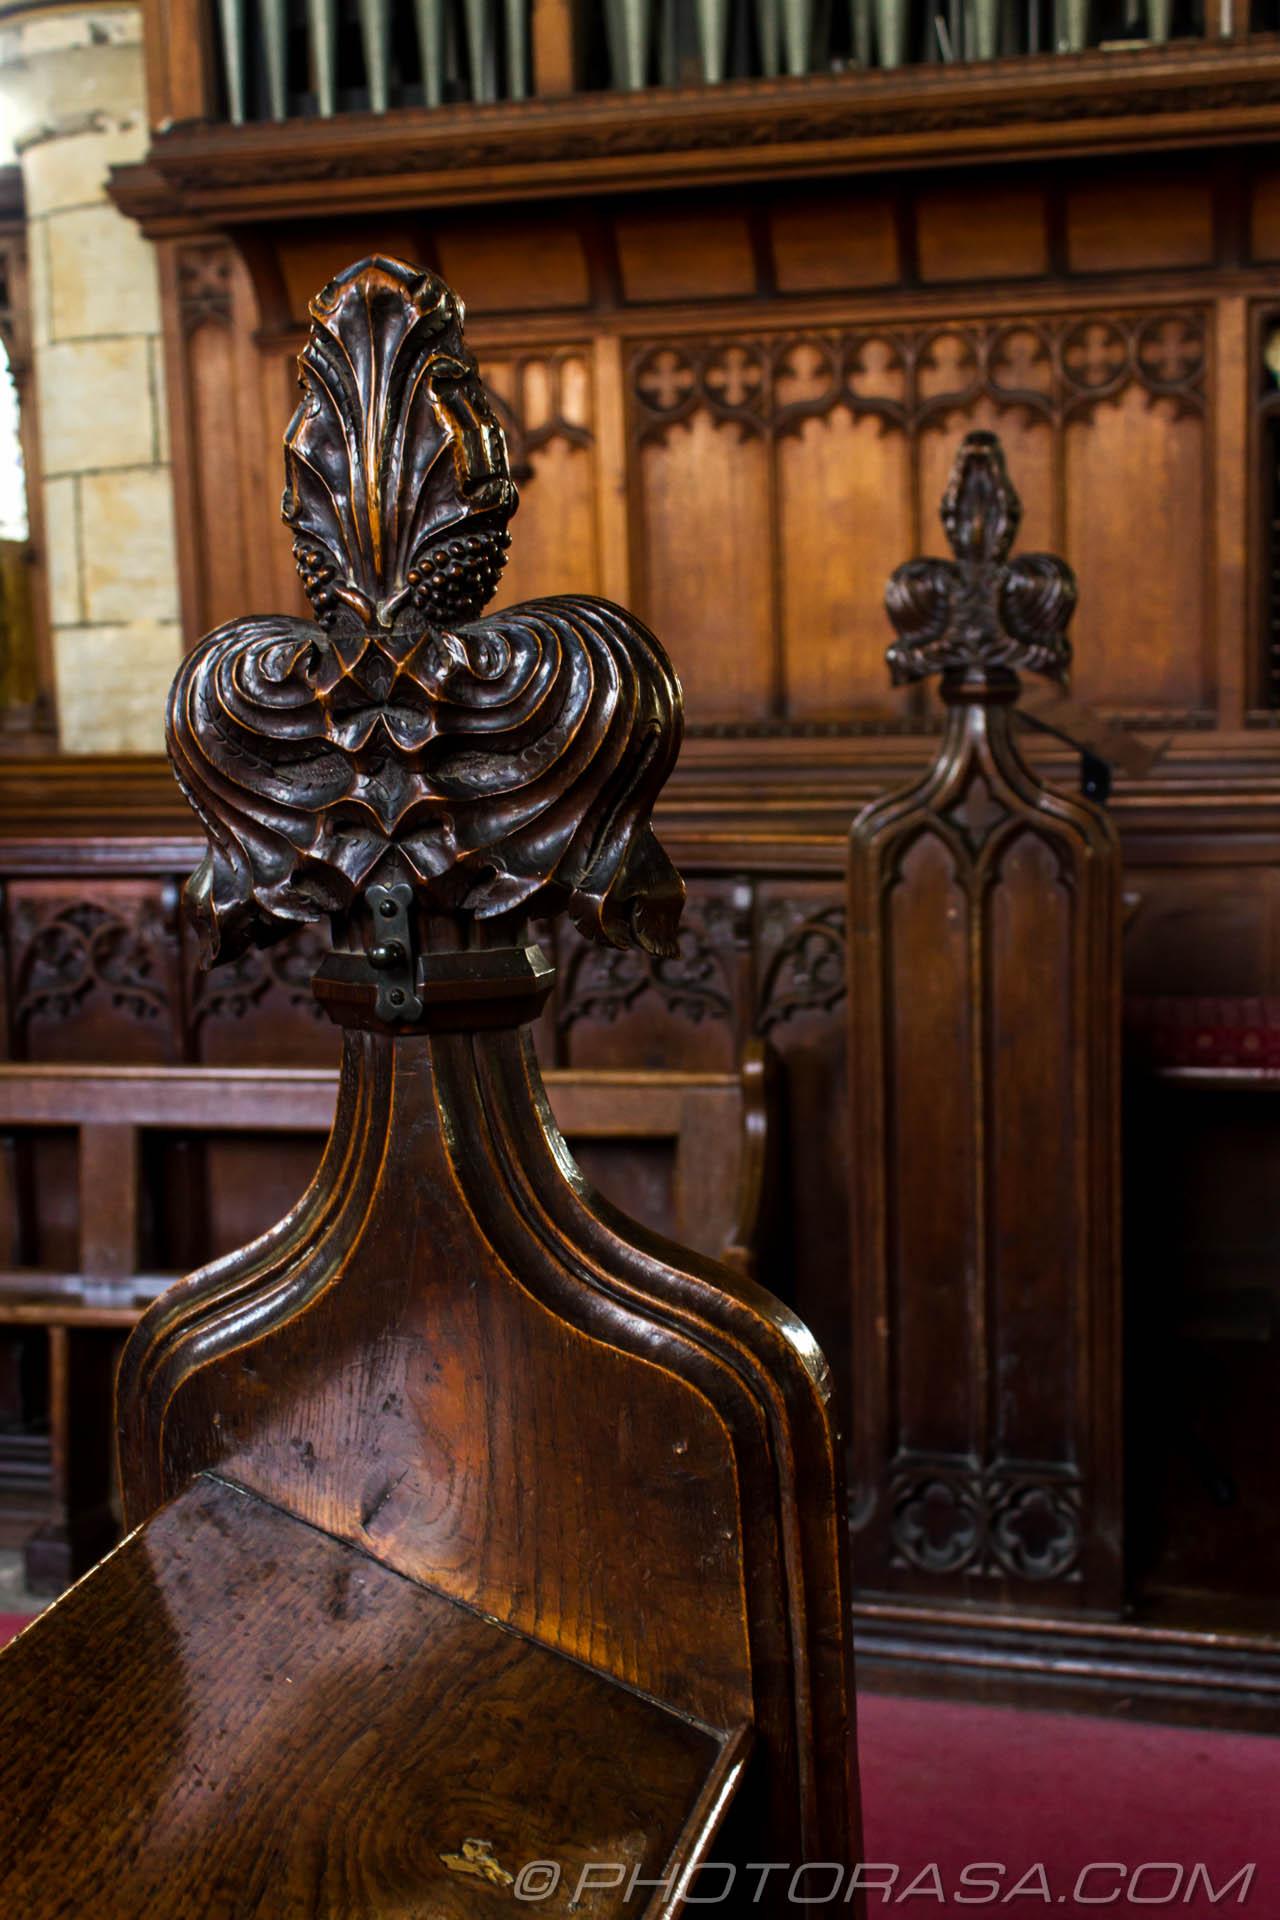 https://photorasa.com/saints-church-staplehurst-kent/pew-flower-carvings/